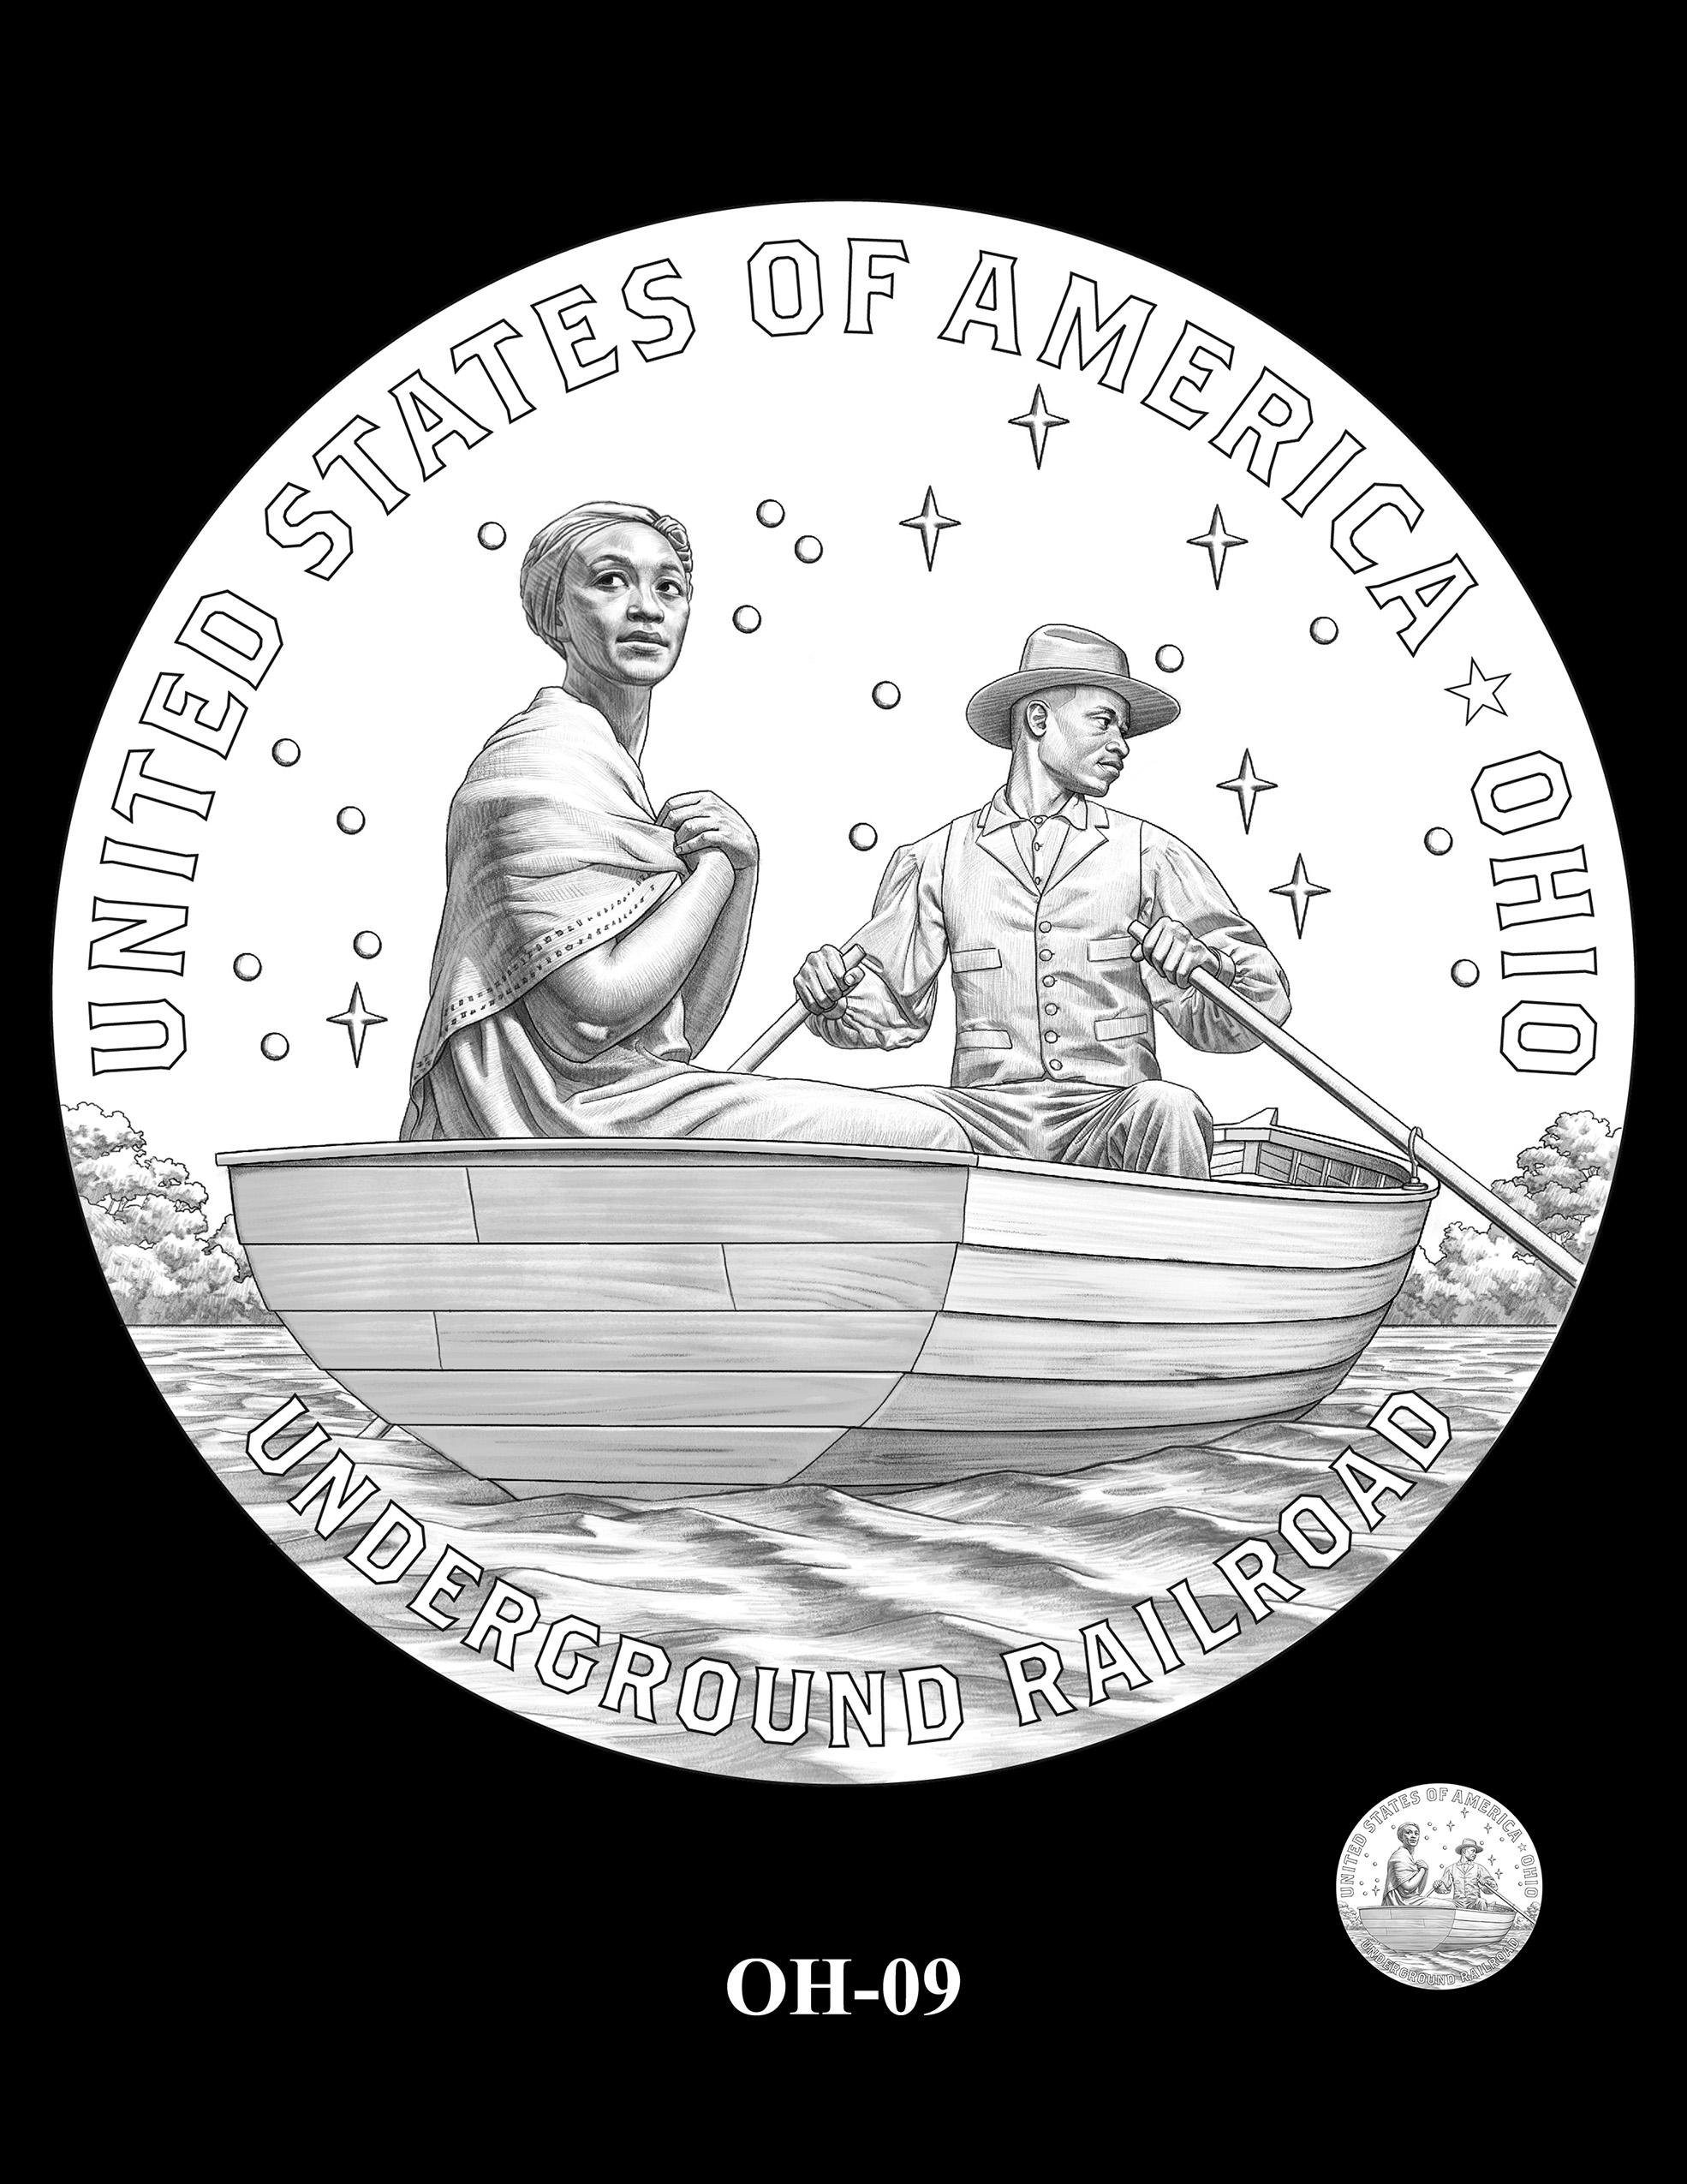 OH-09 -- 2023 American Innovation $1 Coin Program - Ohio